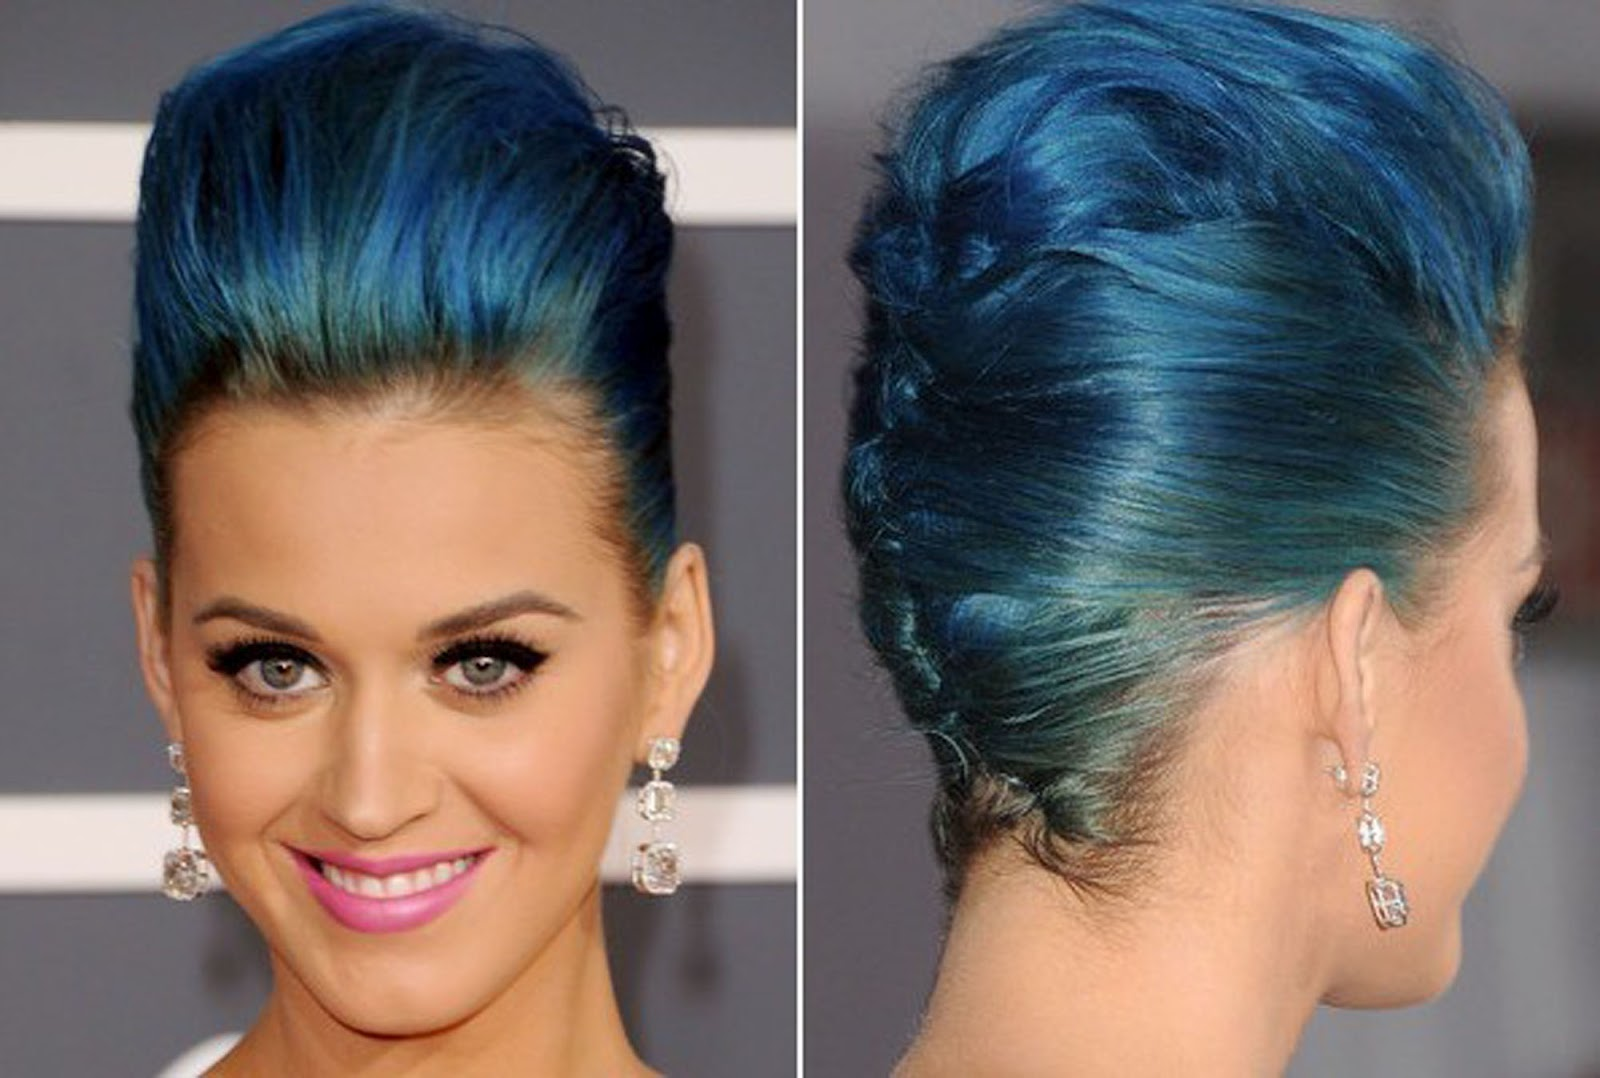 http://4.bp.blogspot.com/-P_8jnA-ziKI/UAXIJO5BdCI/AAAAAAAABU4/sKa6Wv1Wo1c/s1600/Katy-Perry-French-Twist-with-Blue-Hair-Color-as-Formal-Hairstyles.jpg